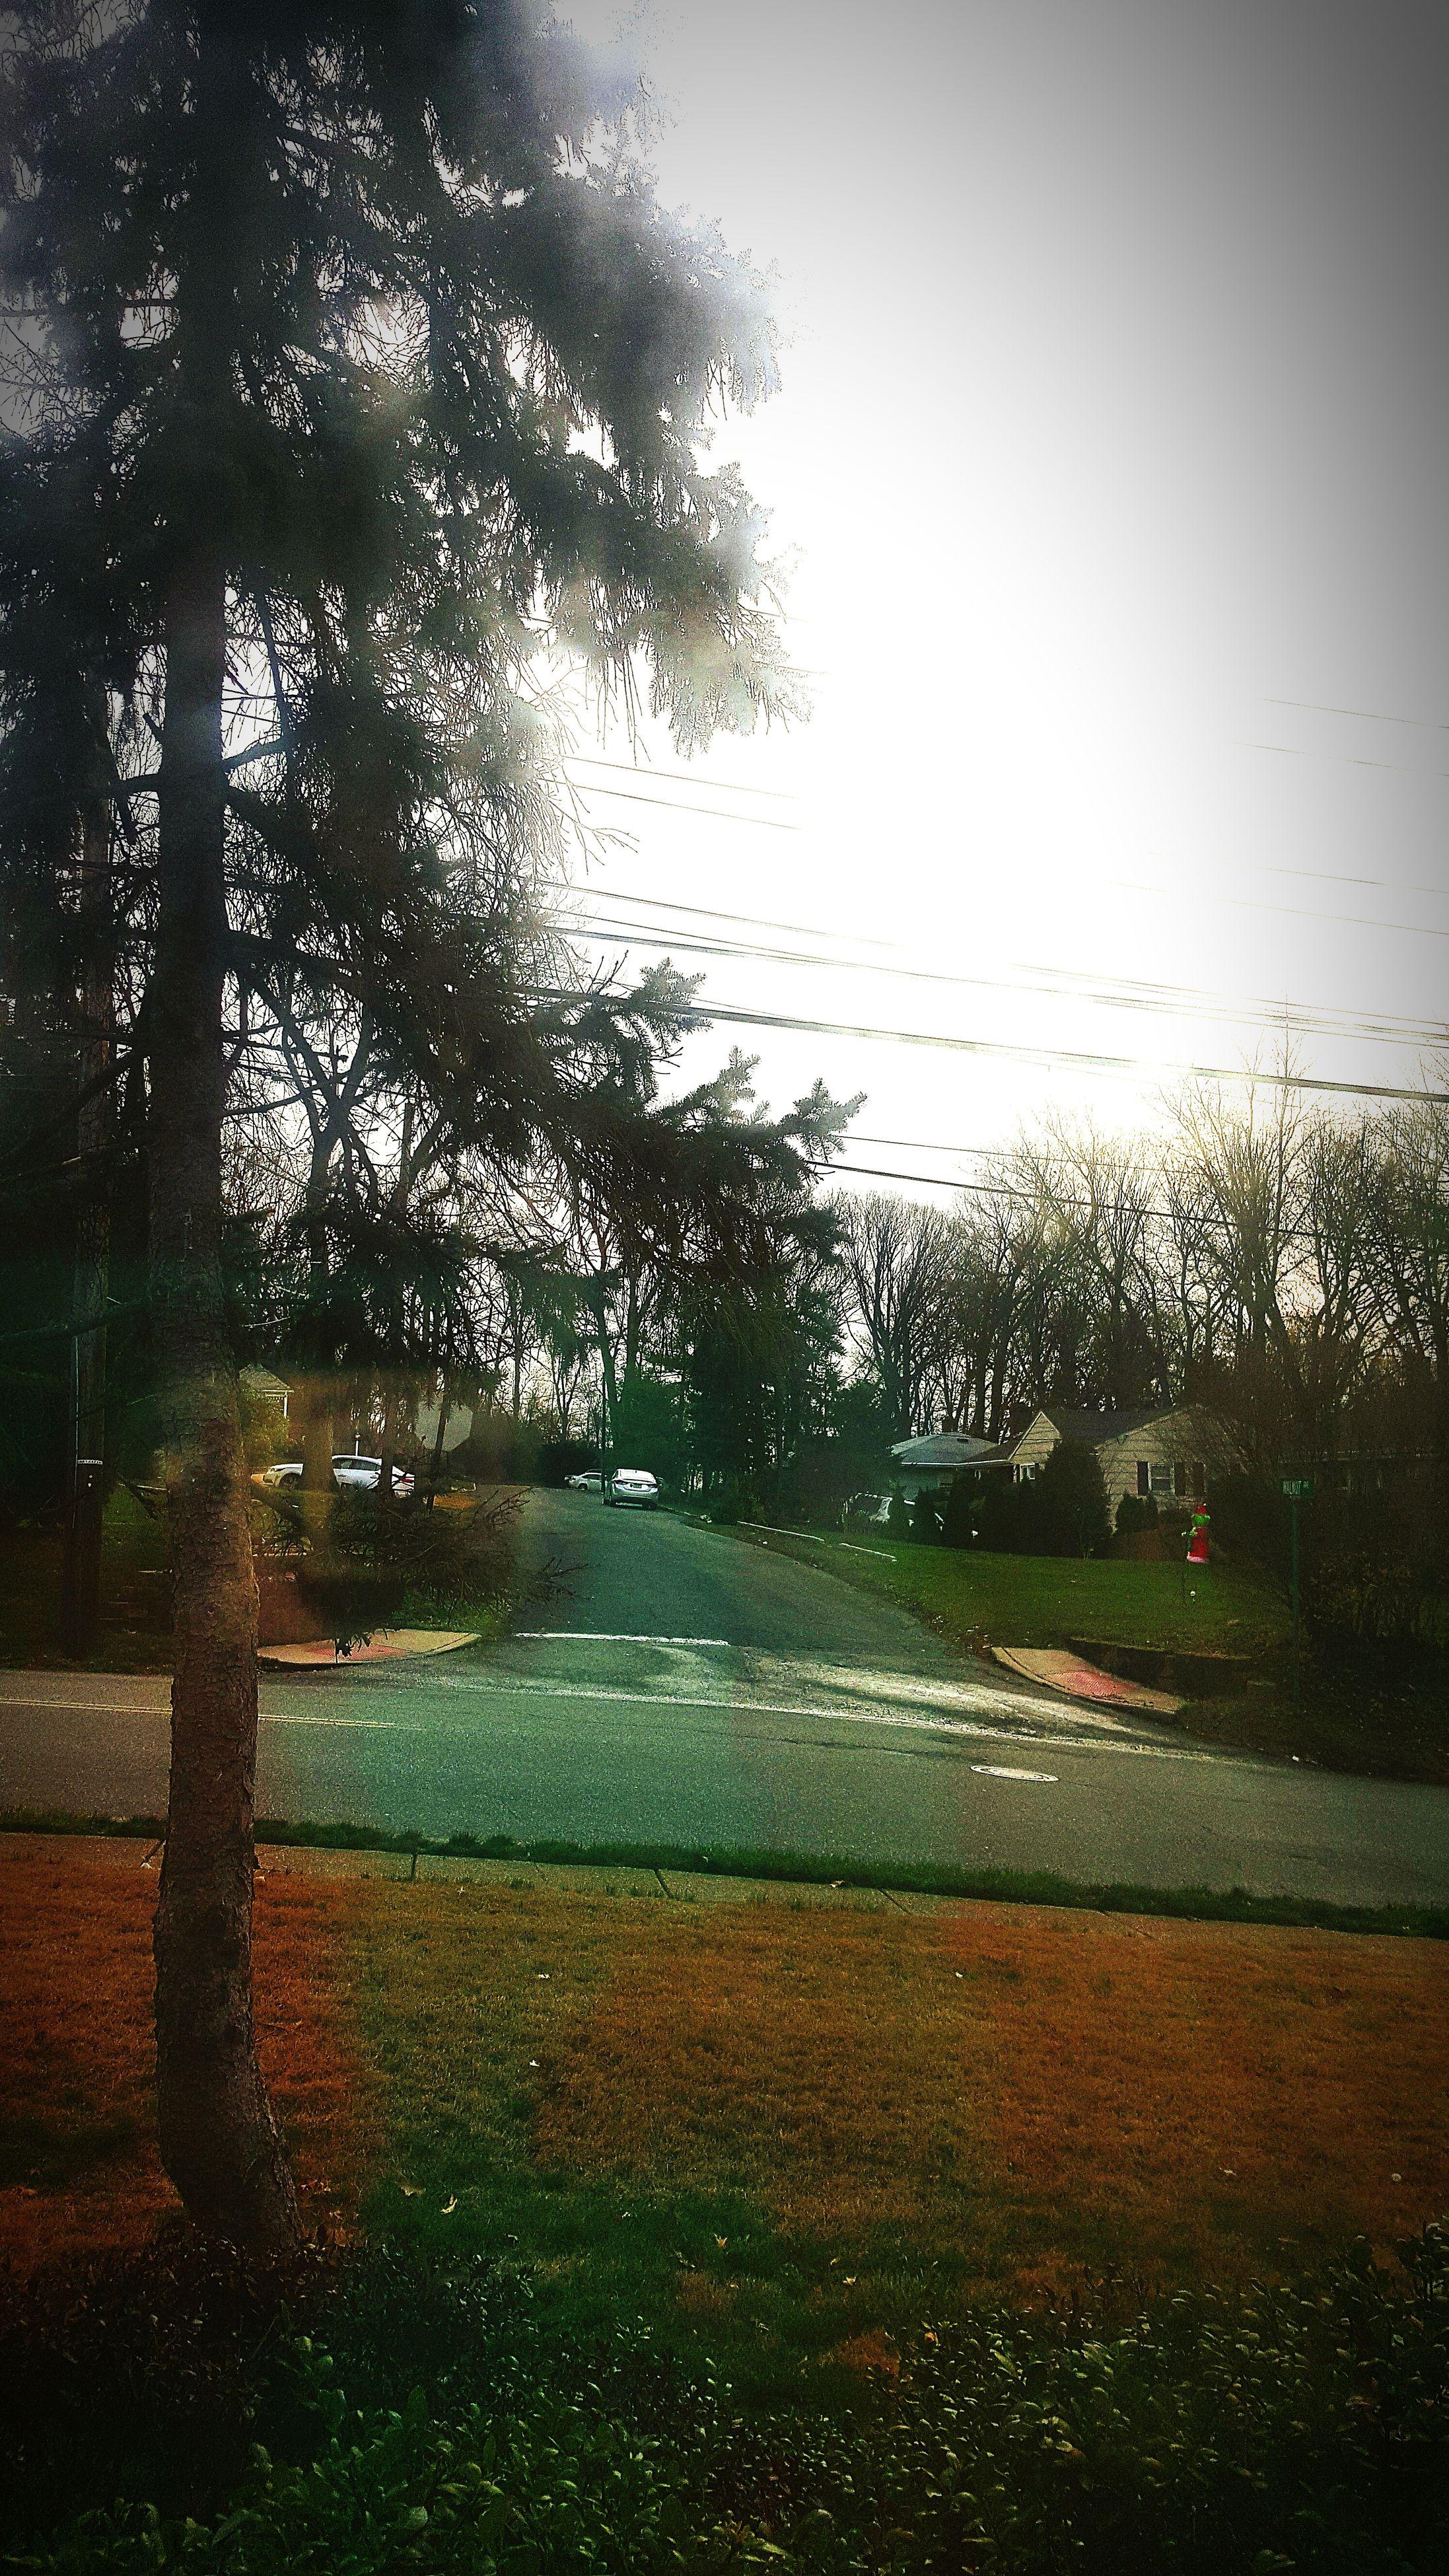 transparent, transportation, drop, glass - material, wet, rain, window, car, tree, road, water, land vehicle, raindrop, vehicle interior, sky, season, mode of transport, windshield, weather, car interior